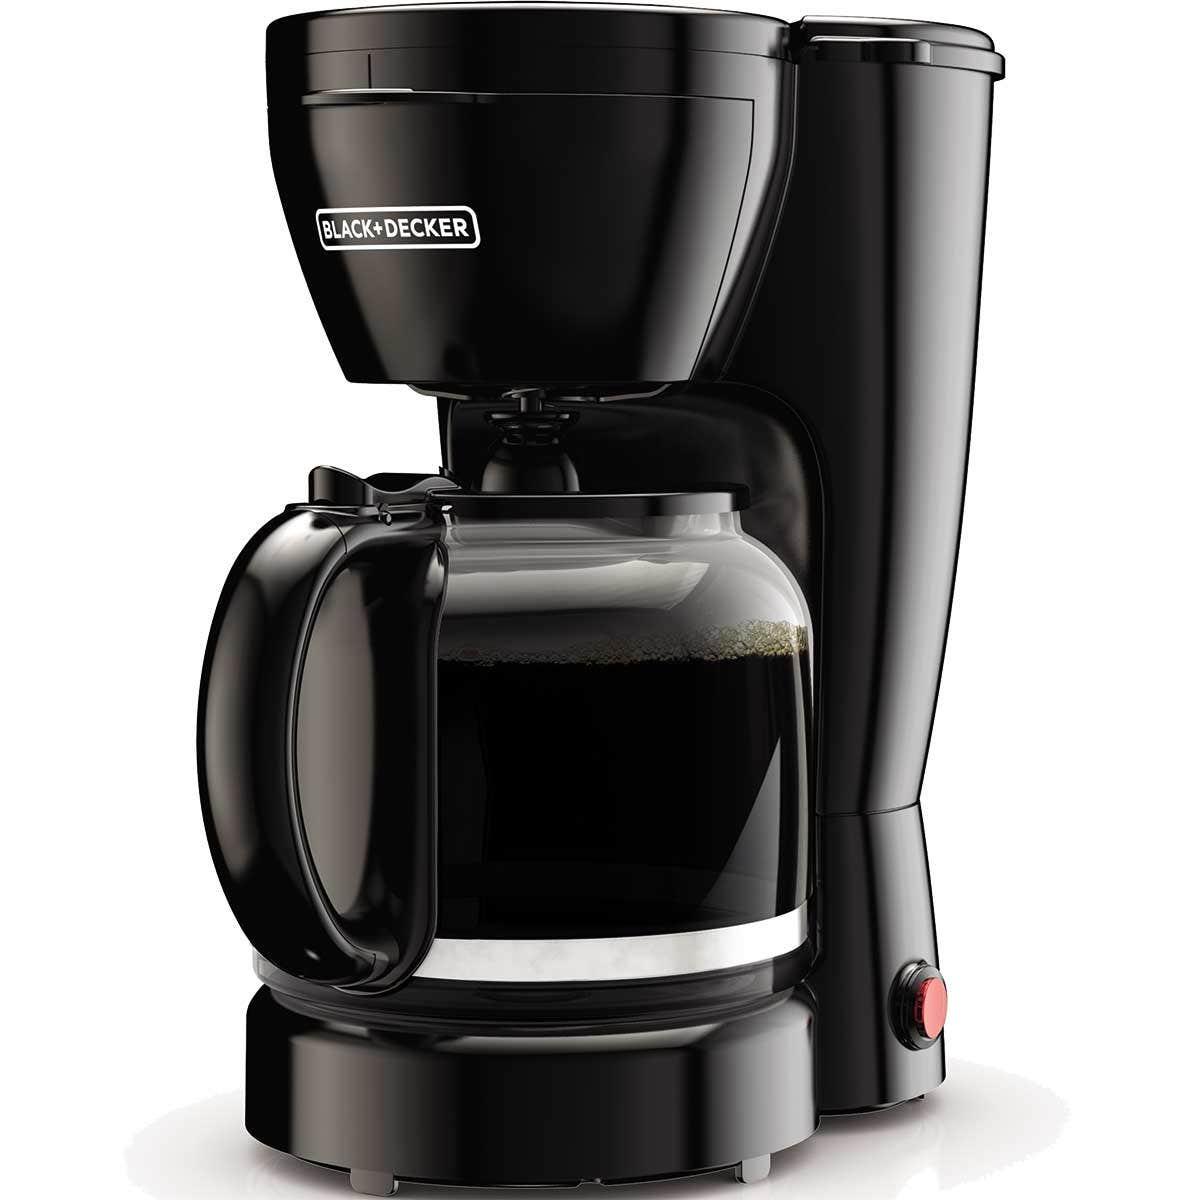 Cafetera Black & Decker 12 tazas CM0910BKD